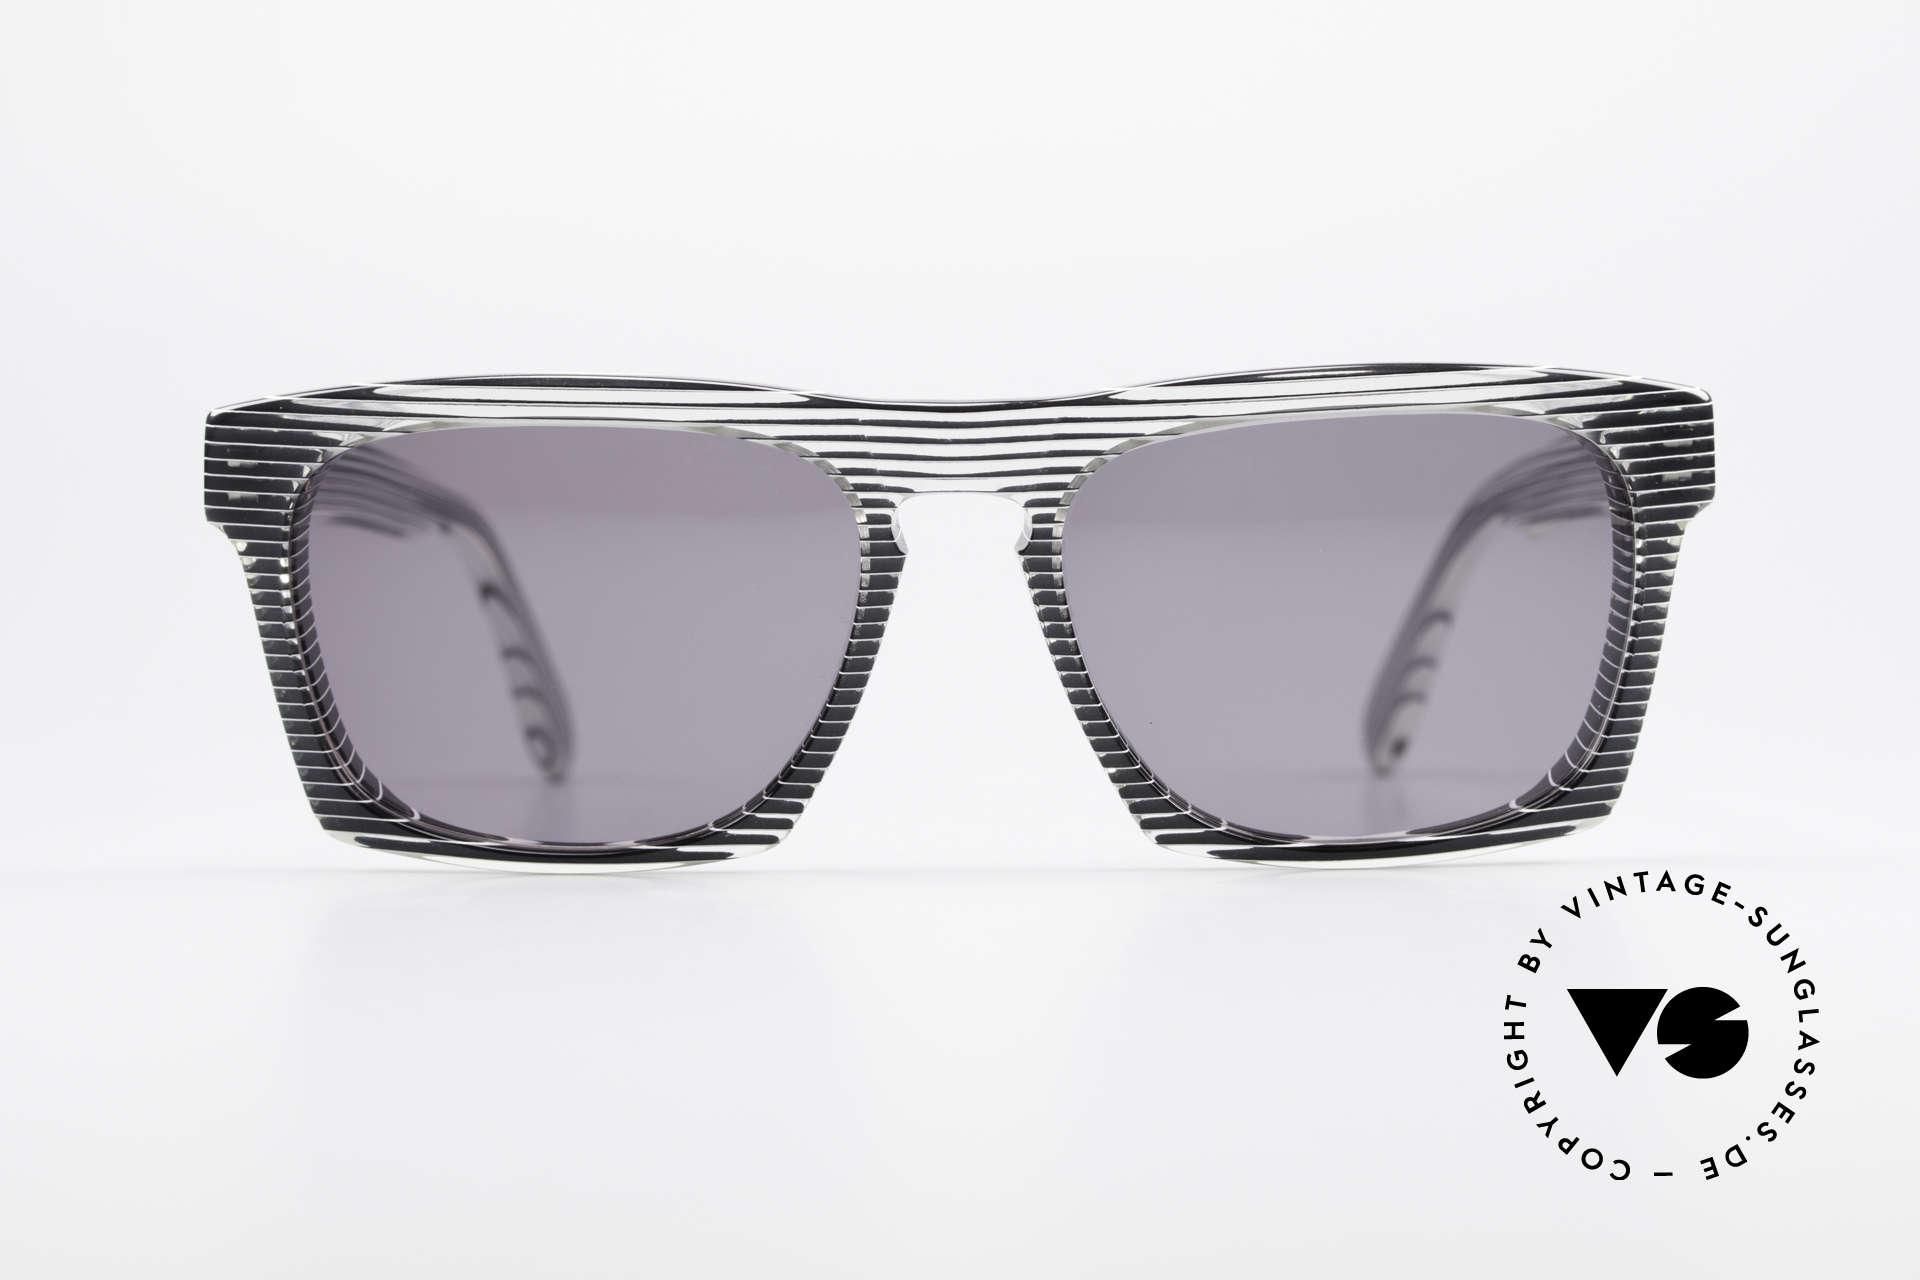 Alain Mikli 707 / 986 Unique Designer Sunglasses, terrific pattern: crystal / gray striped / black & white, Made for Men and Women